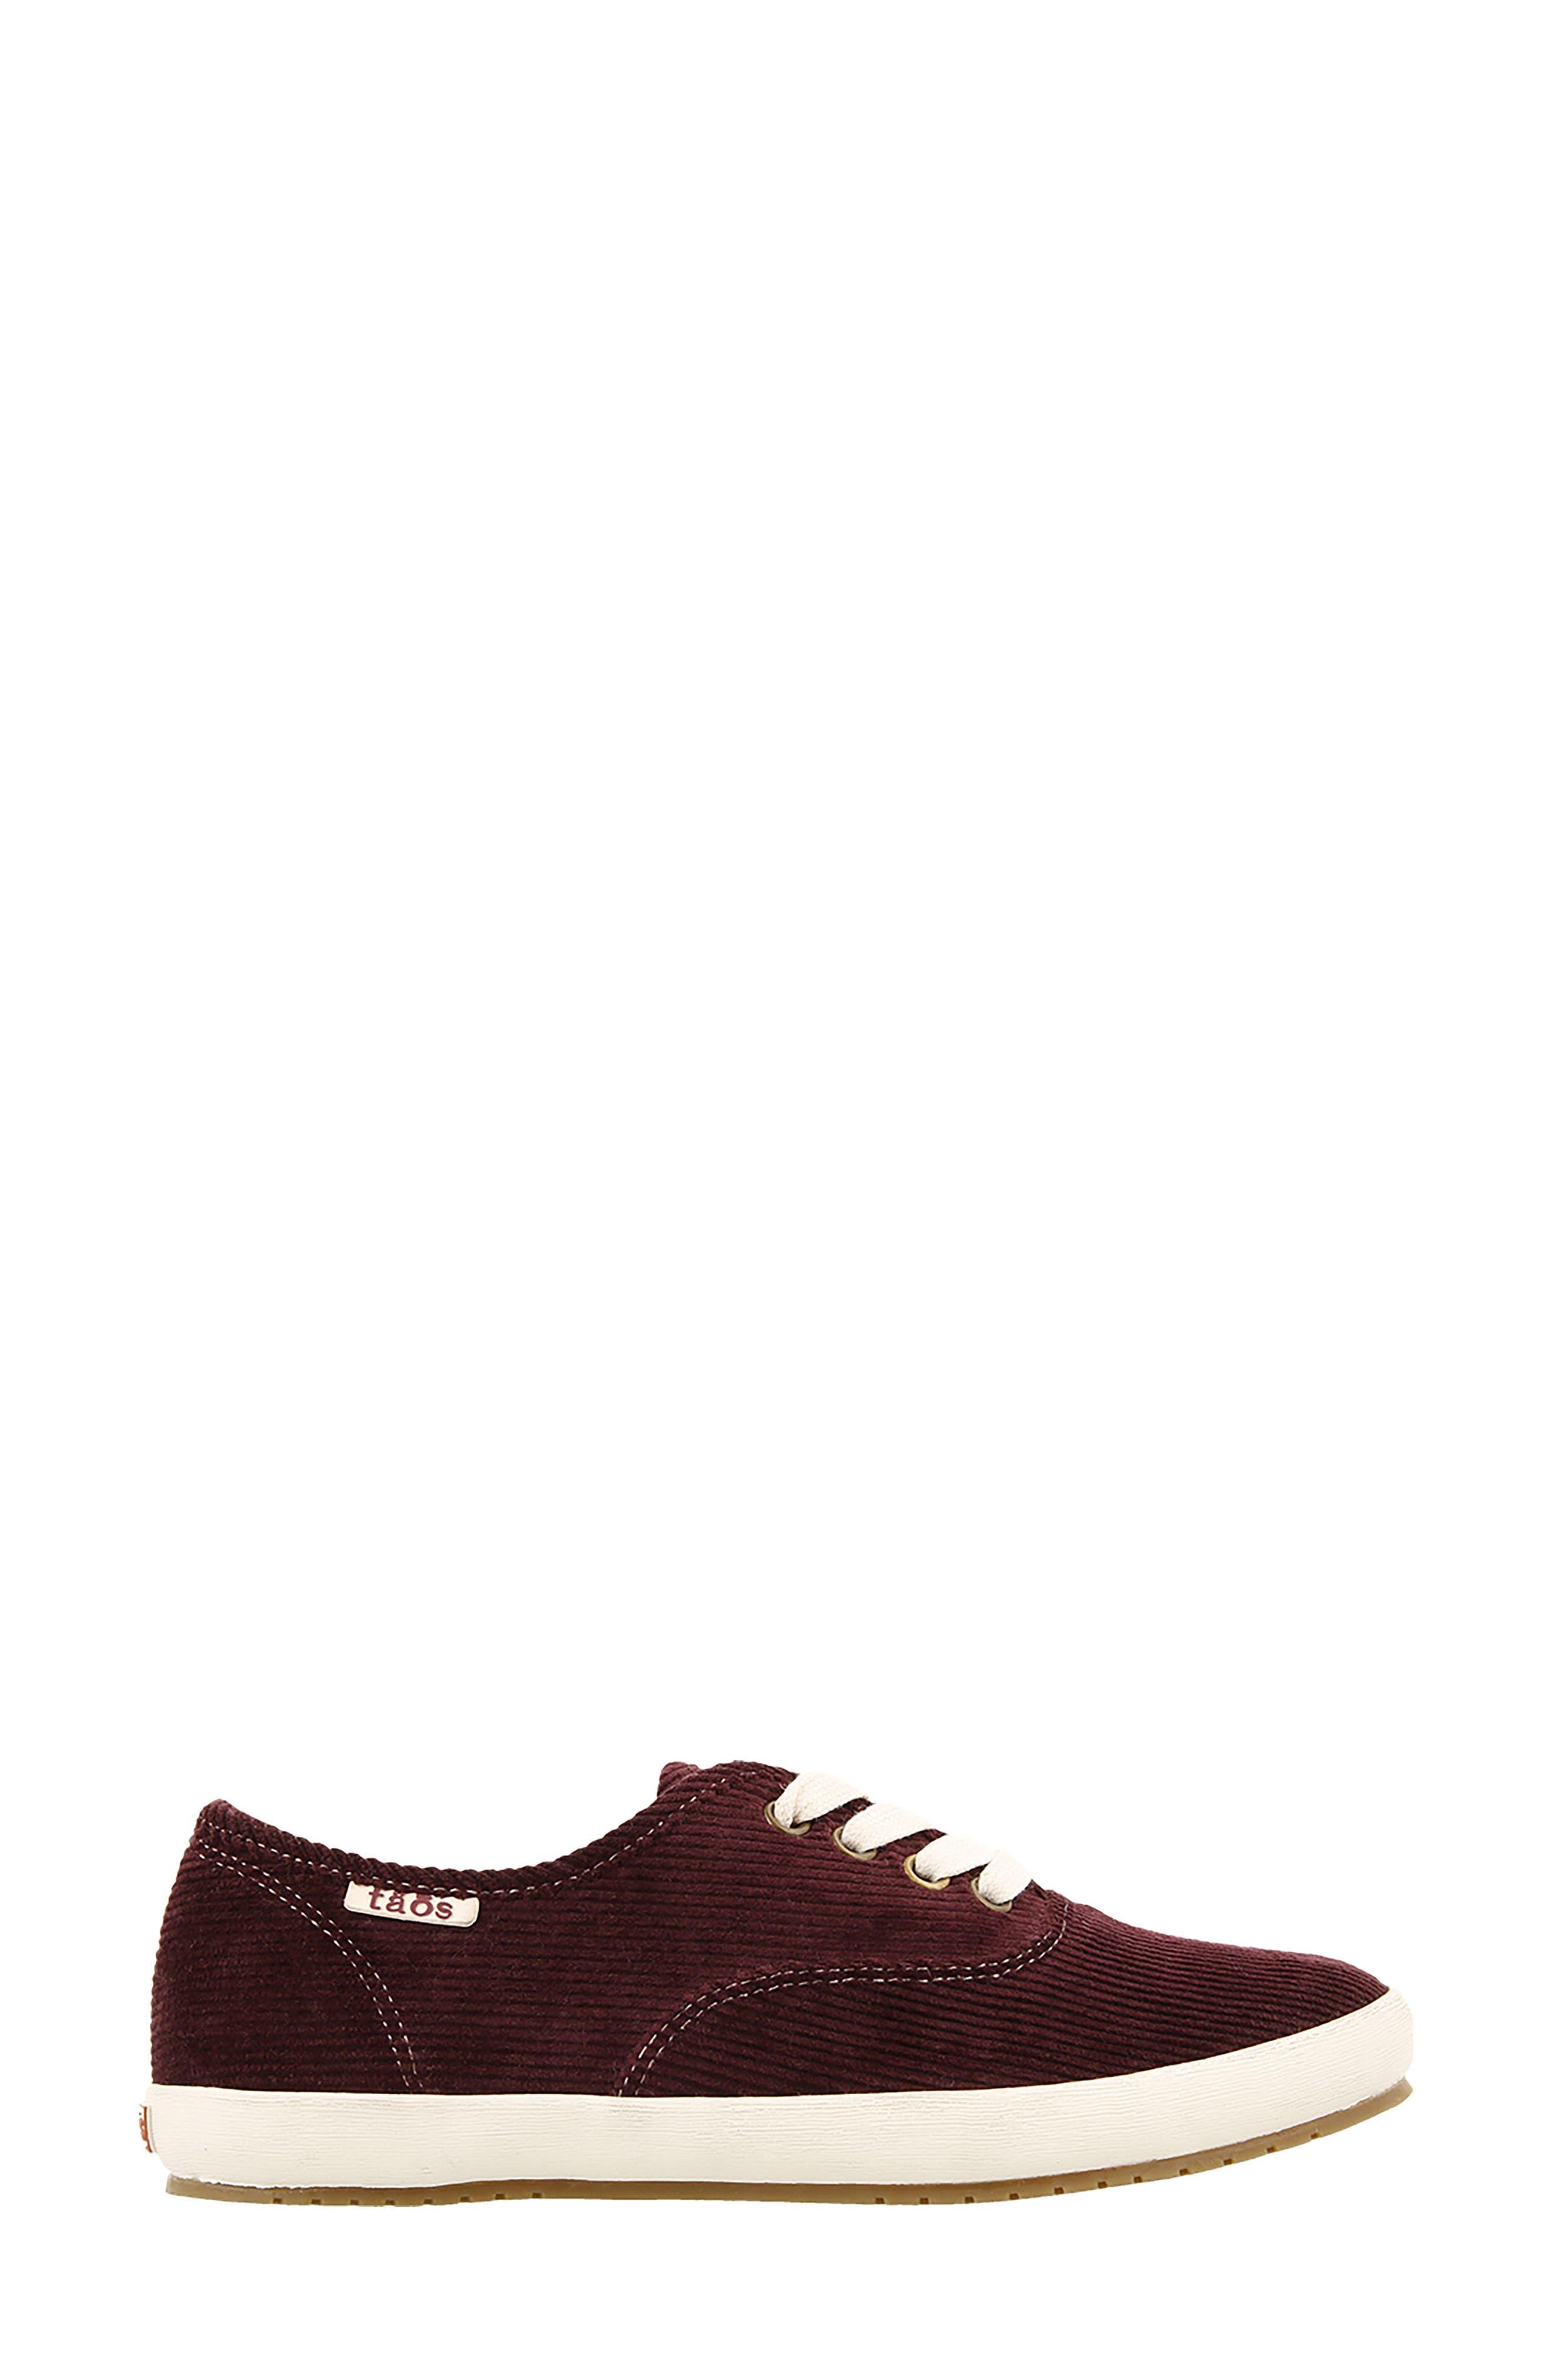 Guest Star Sneaker,                             Alternate thumbnail 3, color,                             Bordeaux Cord Fabric